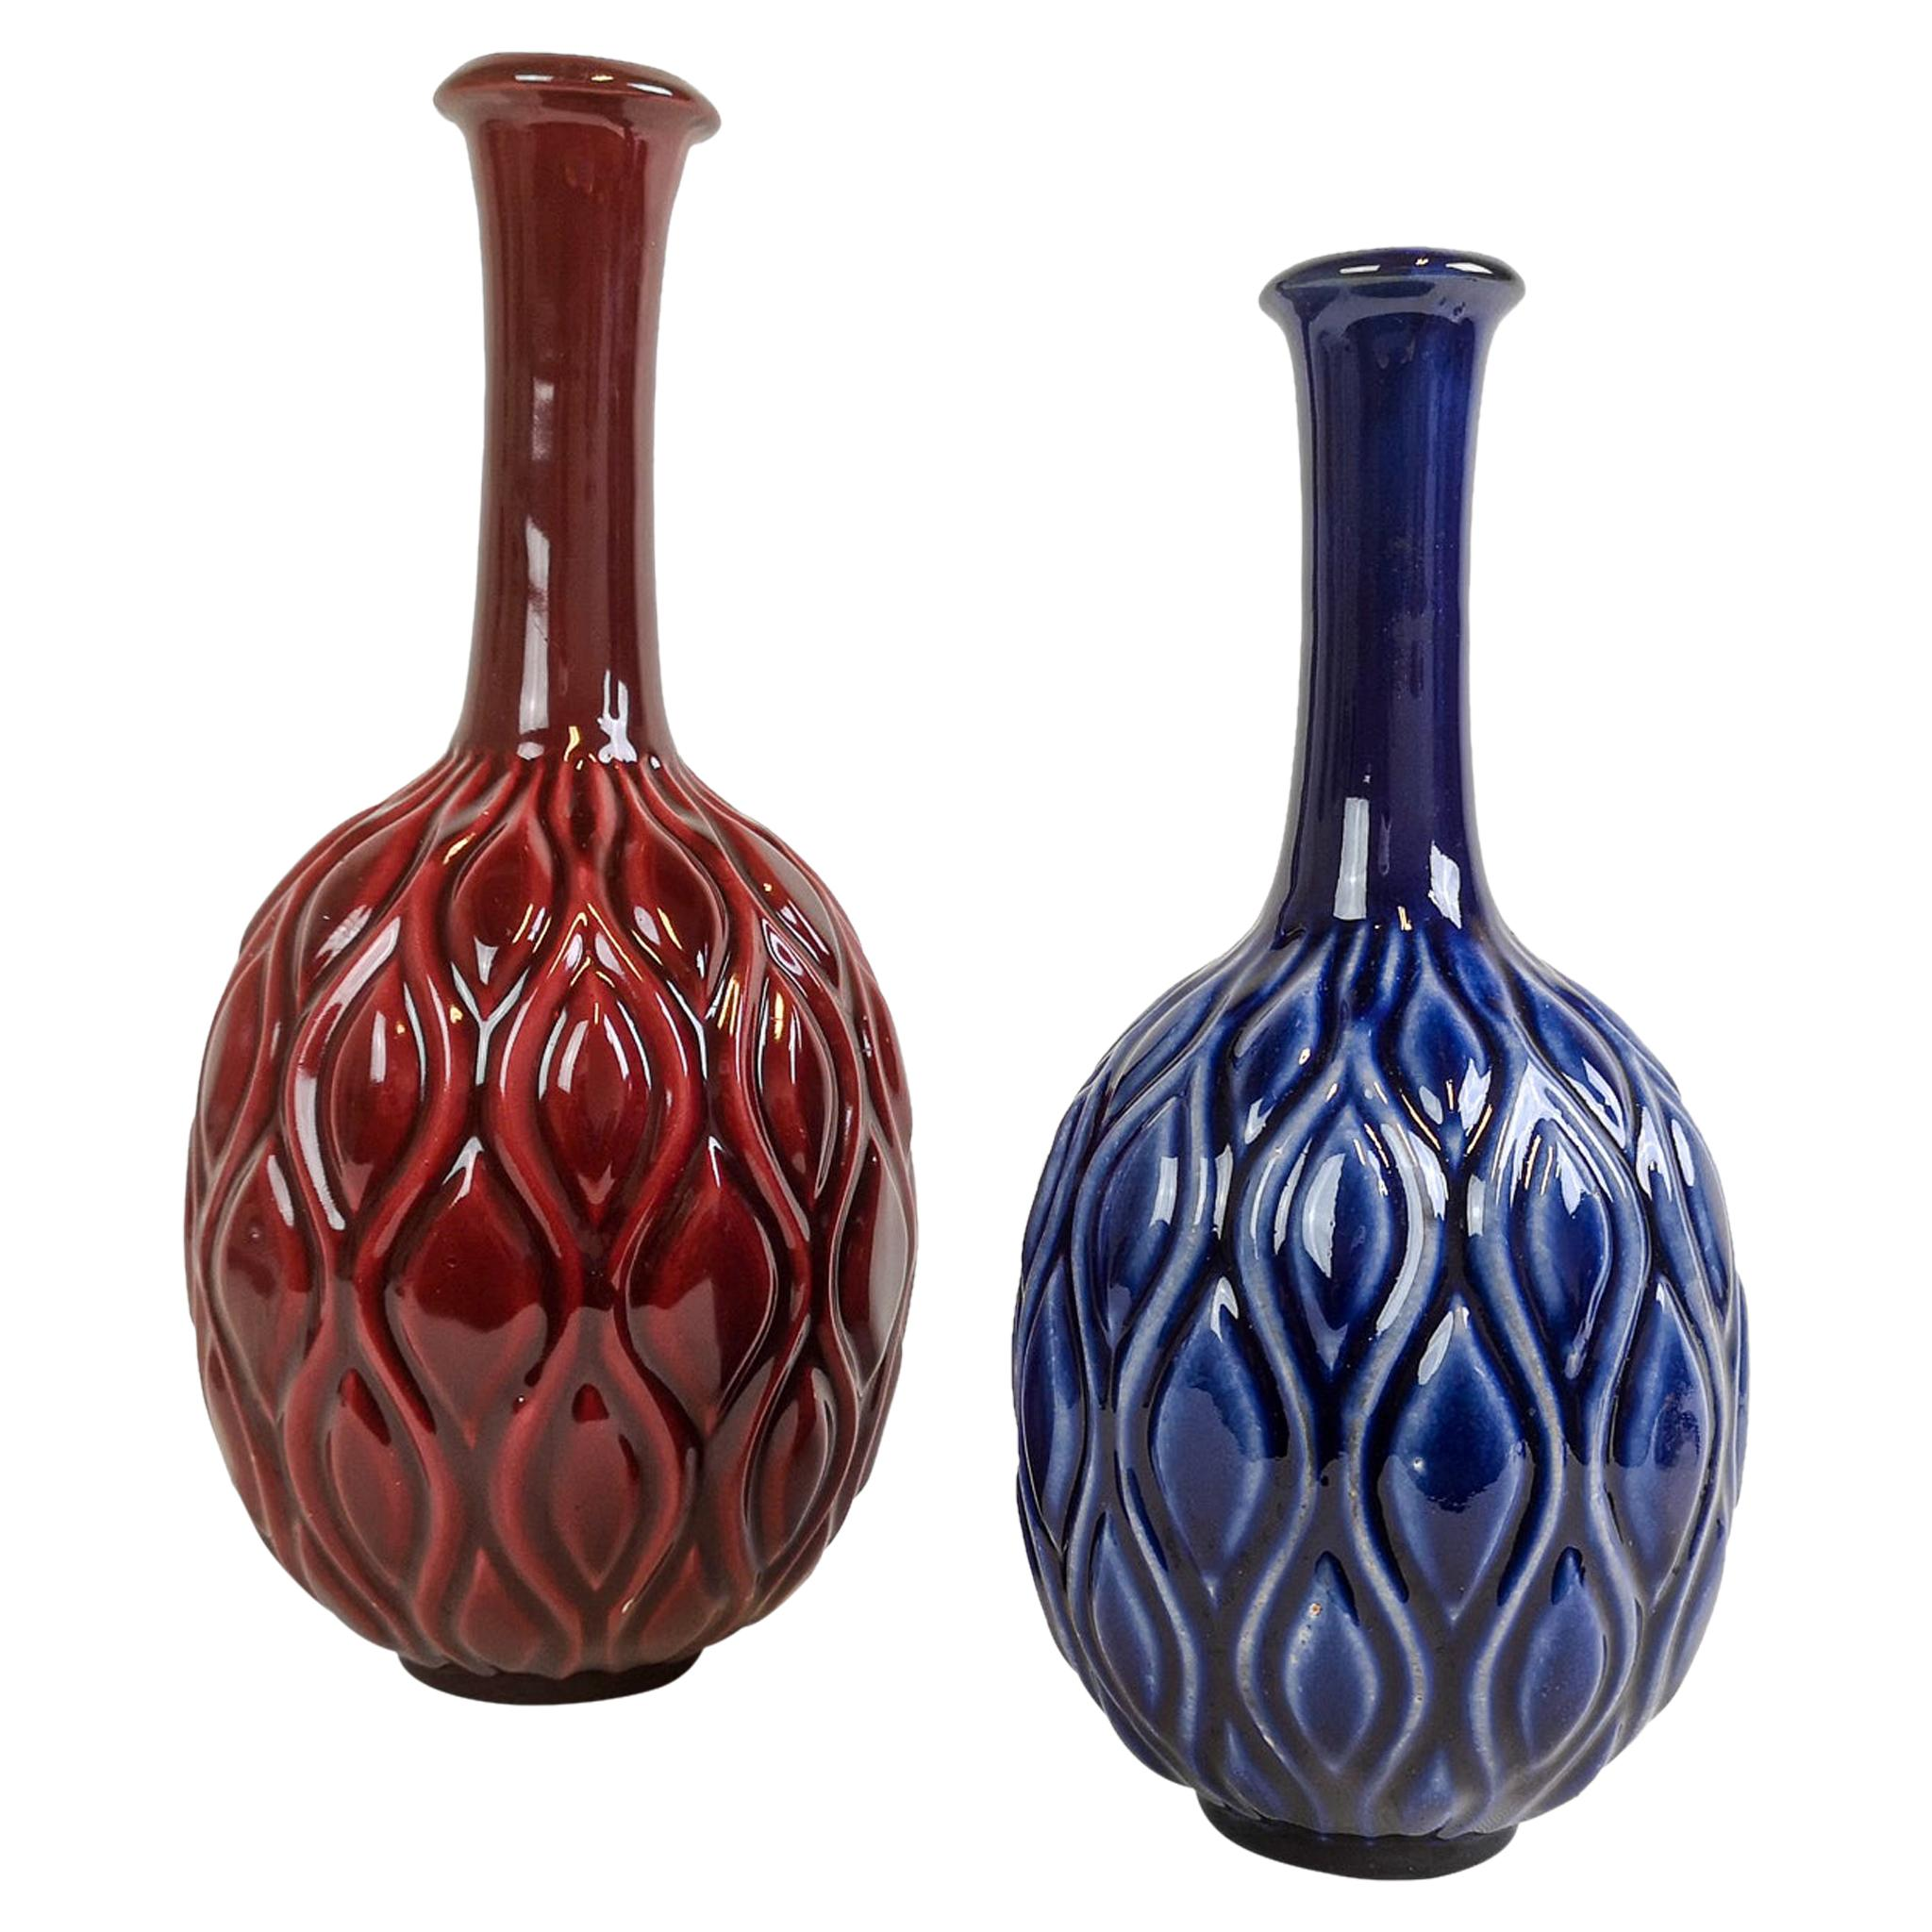 Midcentury Blue and Red Peacock Vases Sven Erik Skawonius Upsala Ekeby, 1950s